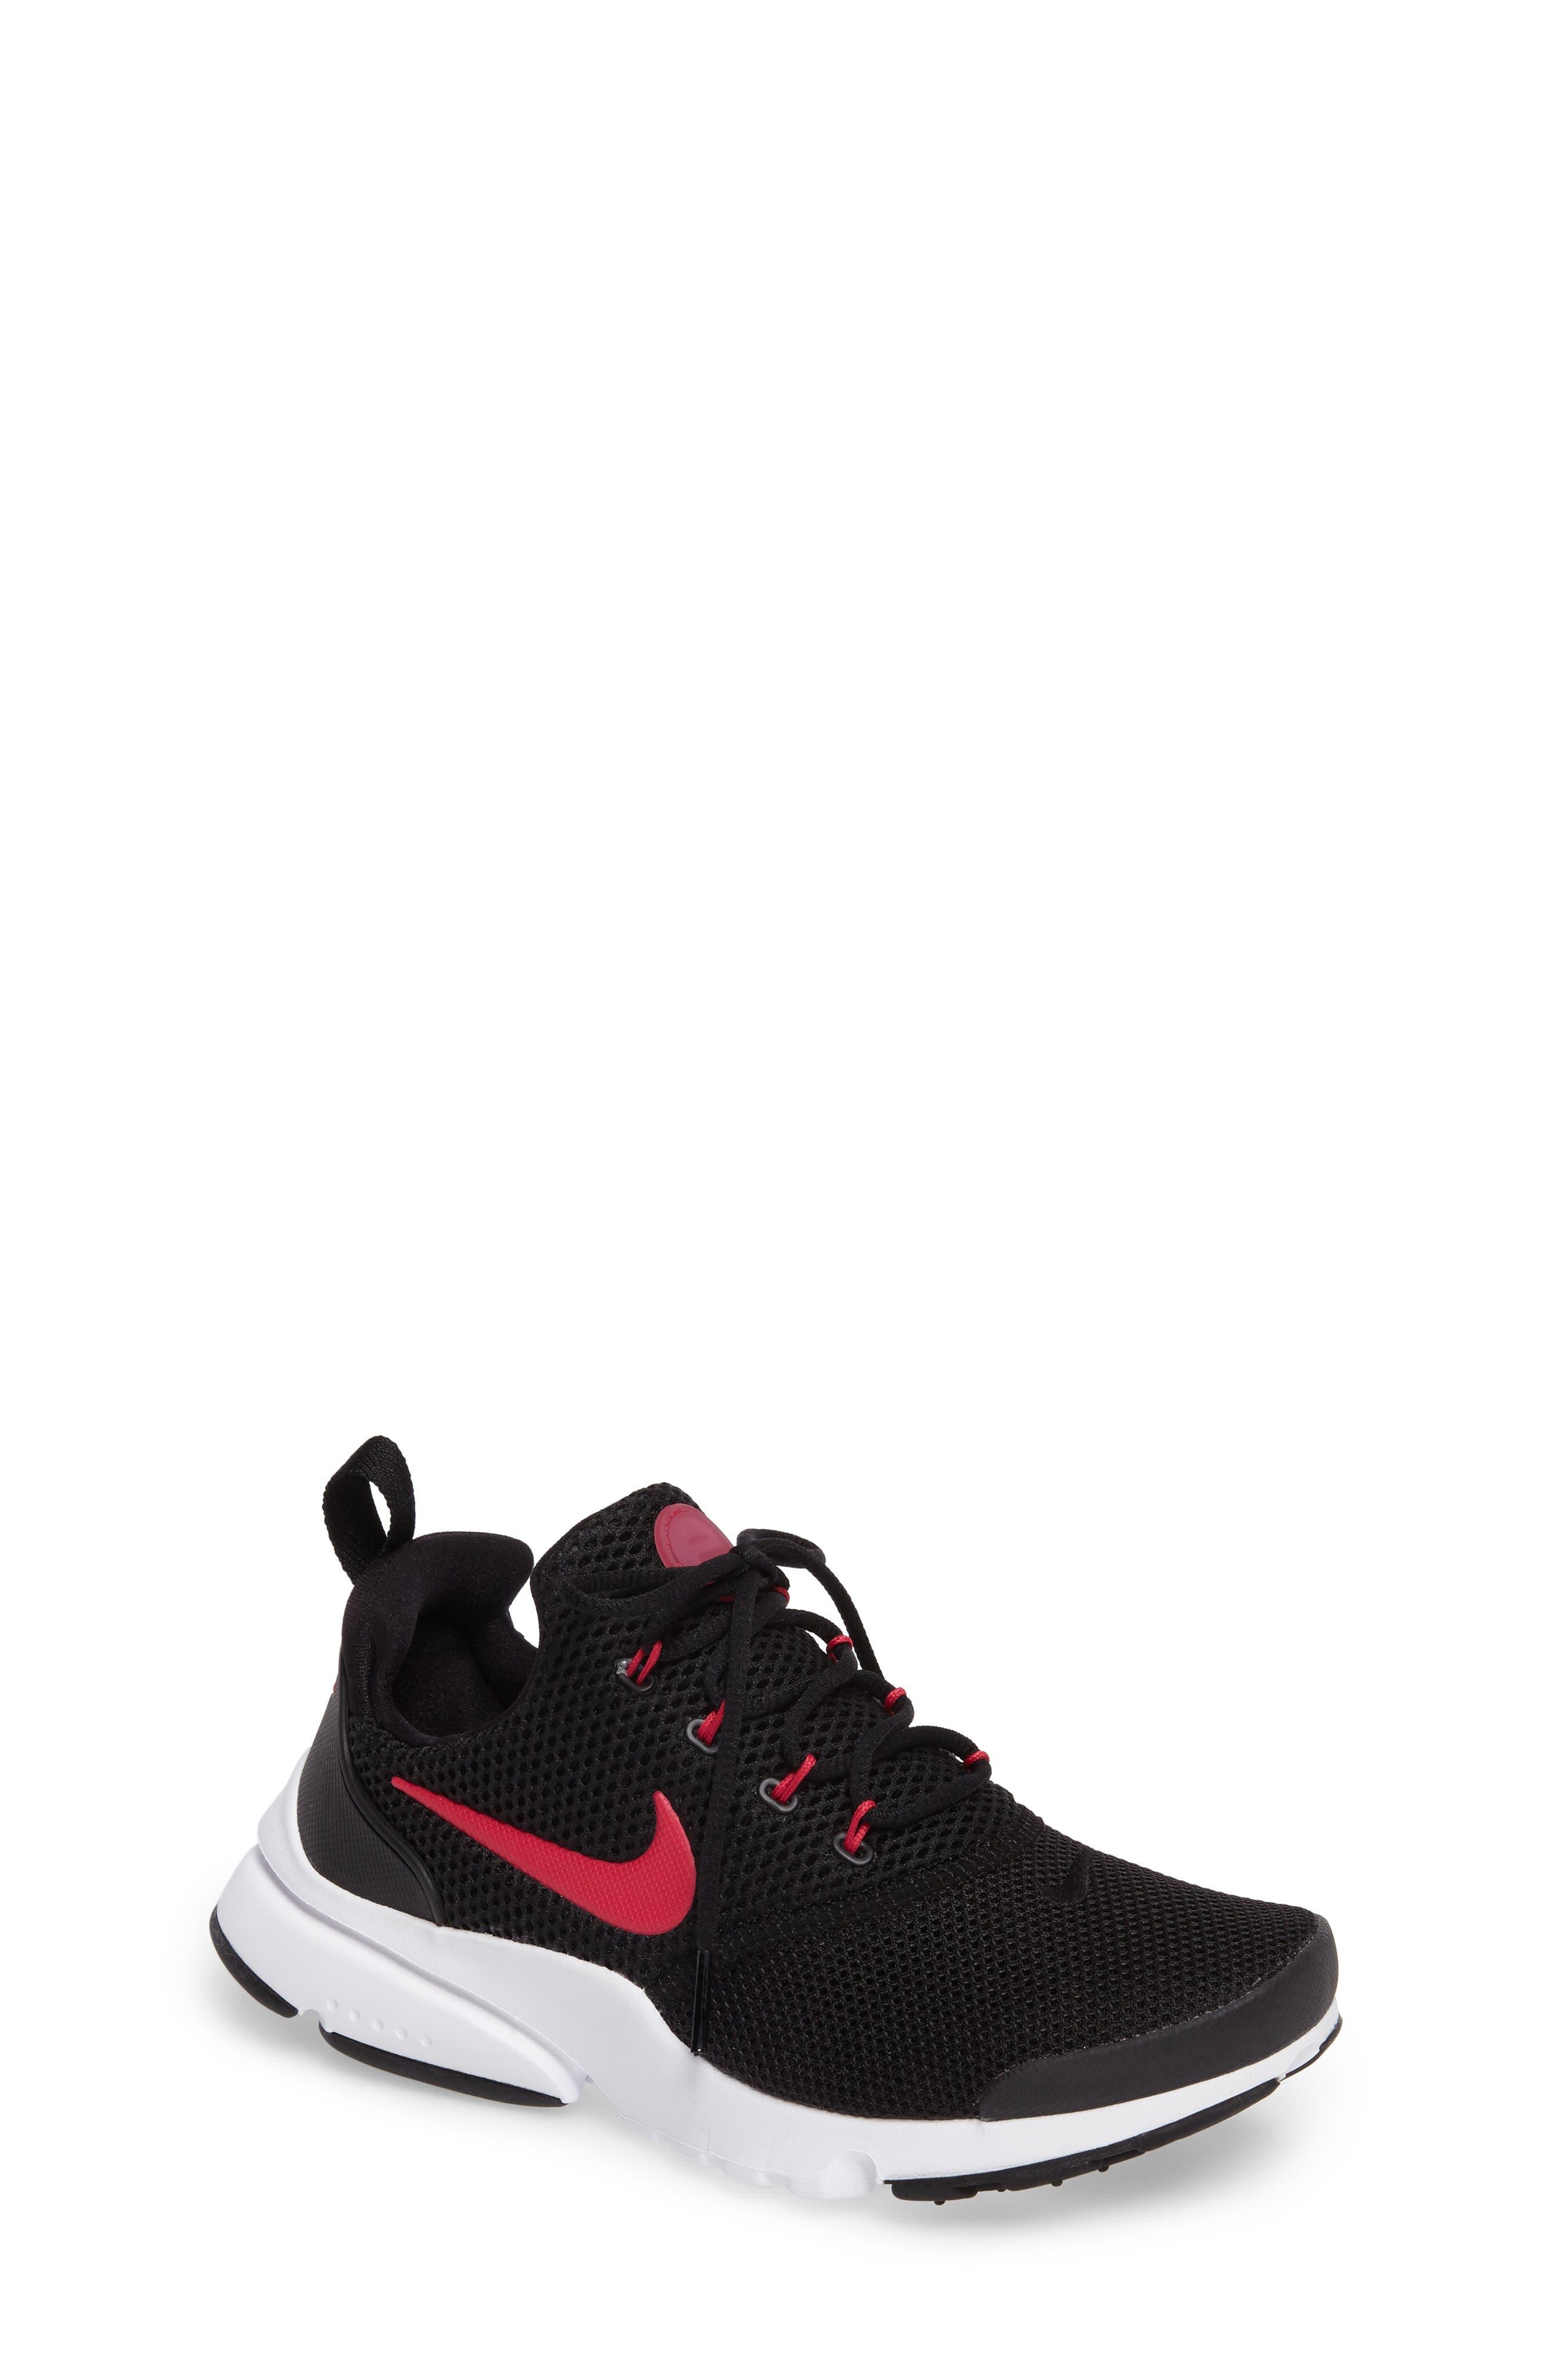 Alternate Image 1 Selected - Nike Presto Fly Sneaker (Big Kid)